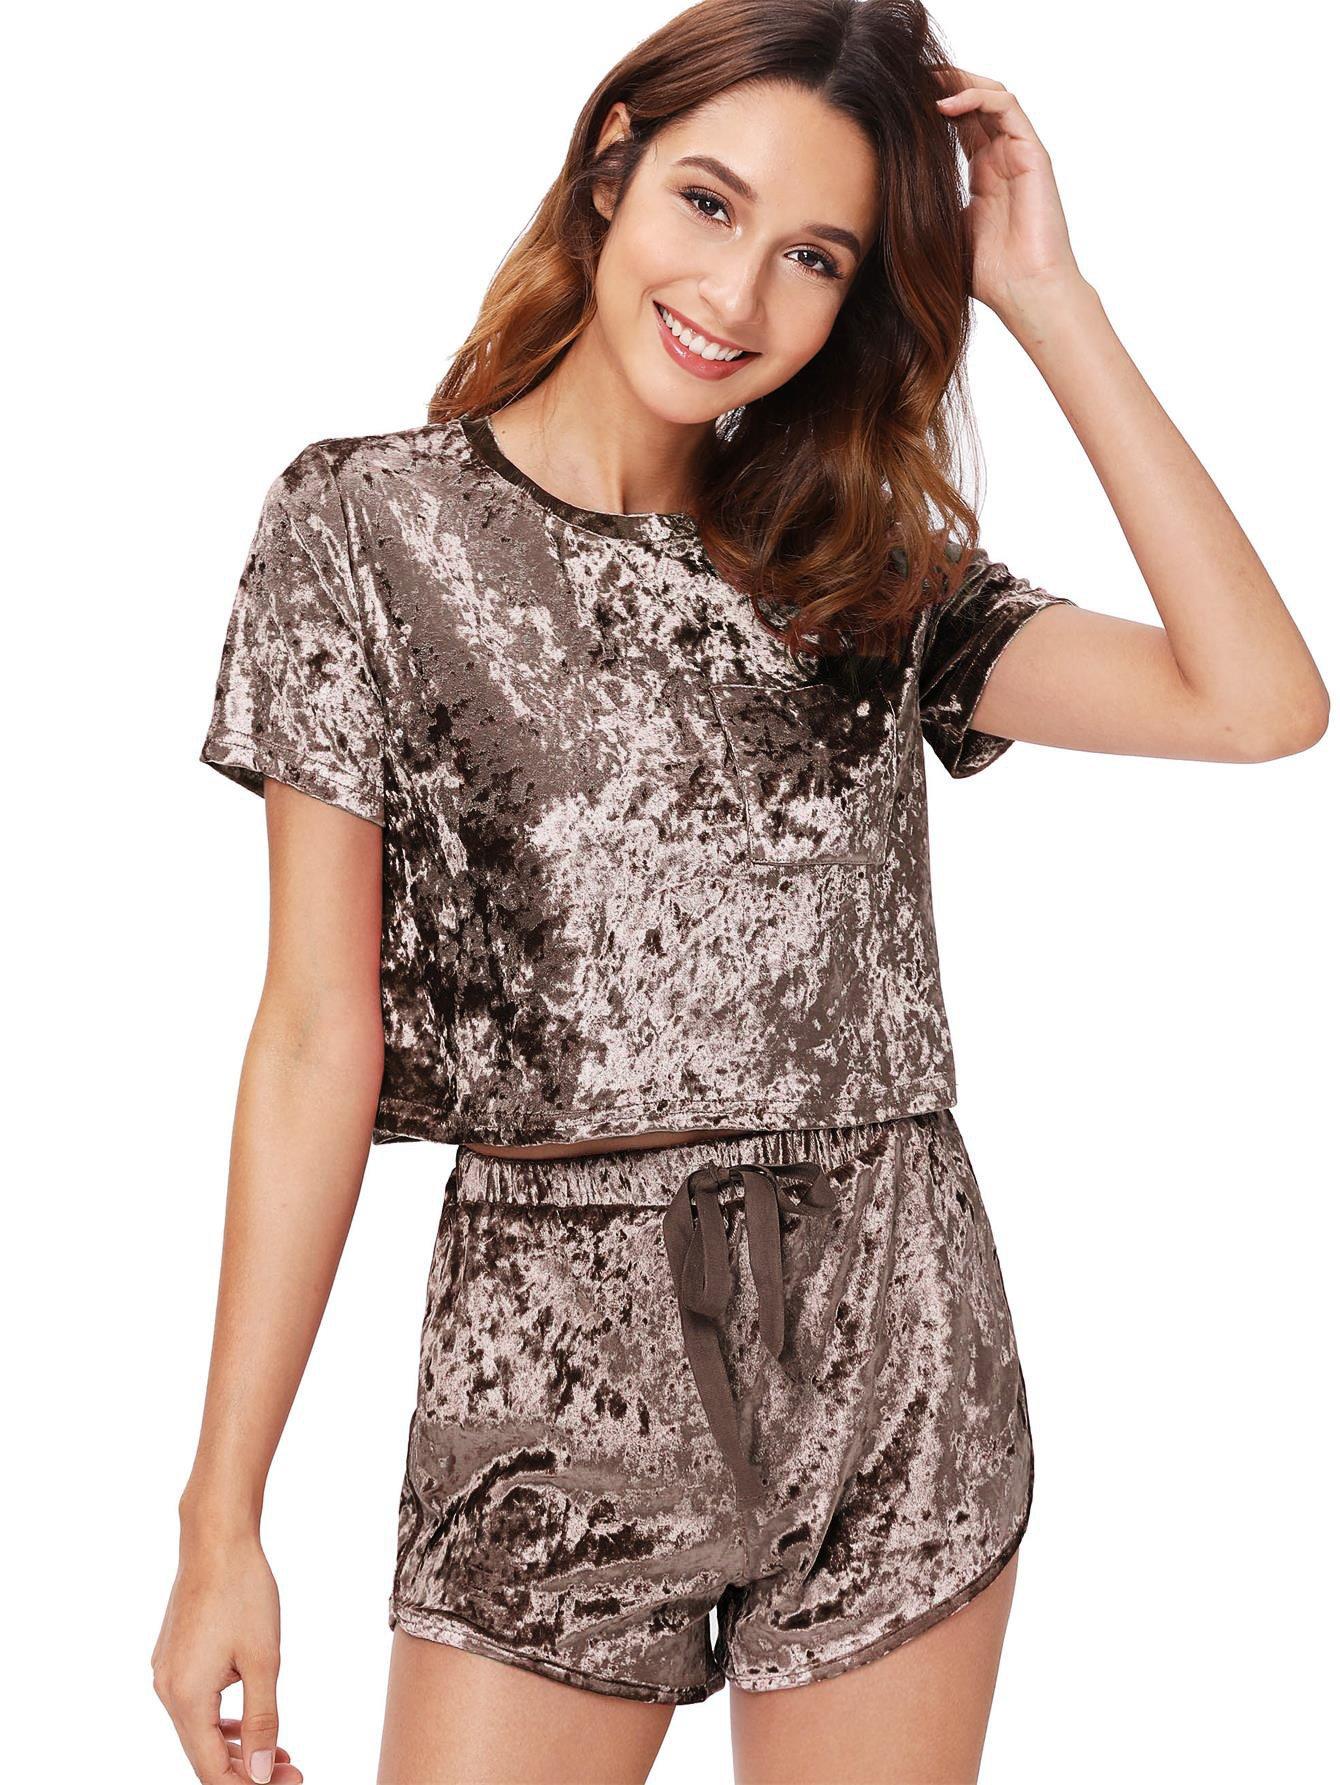 MakeMeChic Women's Vintage Velvet Pocket Crop Top Tee T-shirt and Shorts Set Coffee S